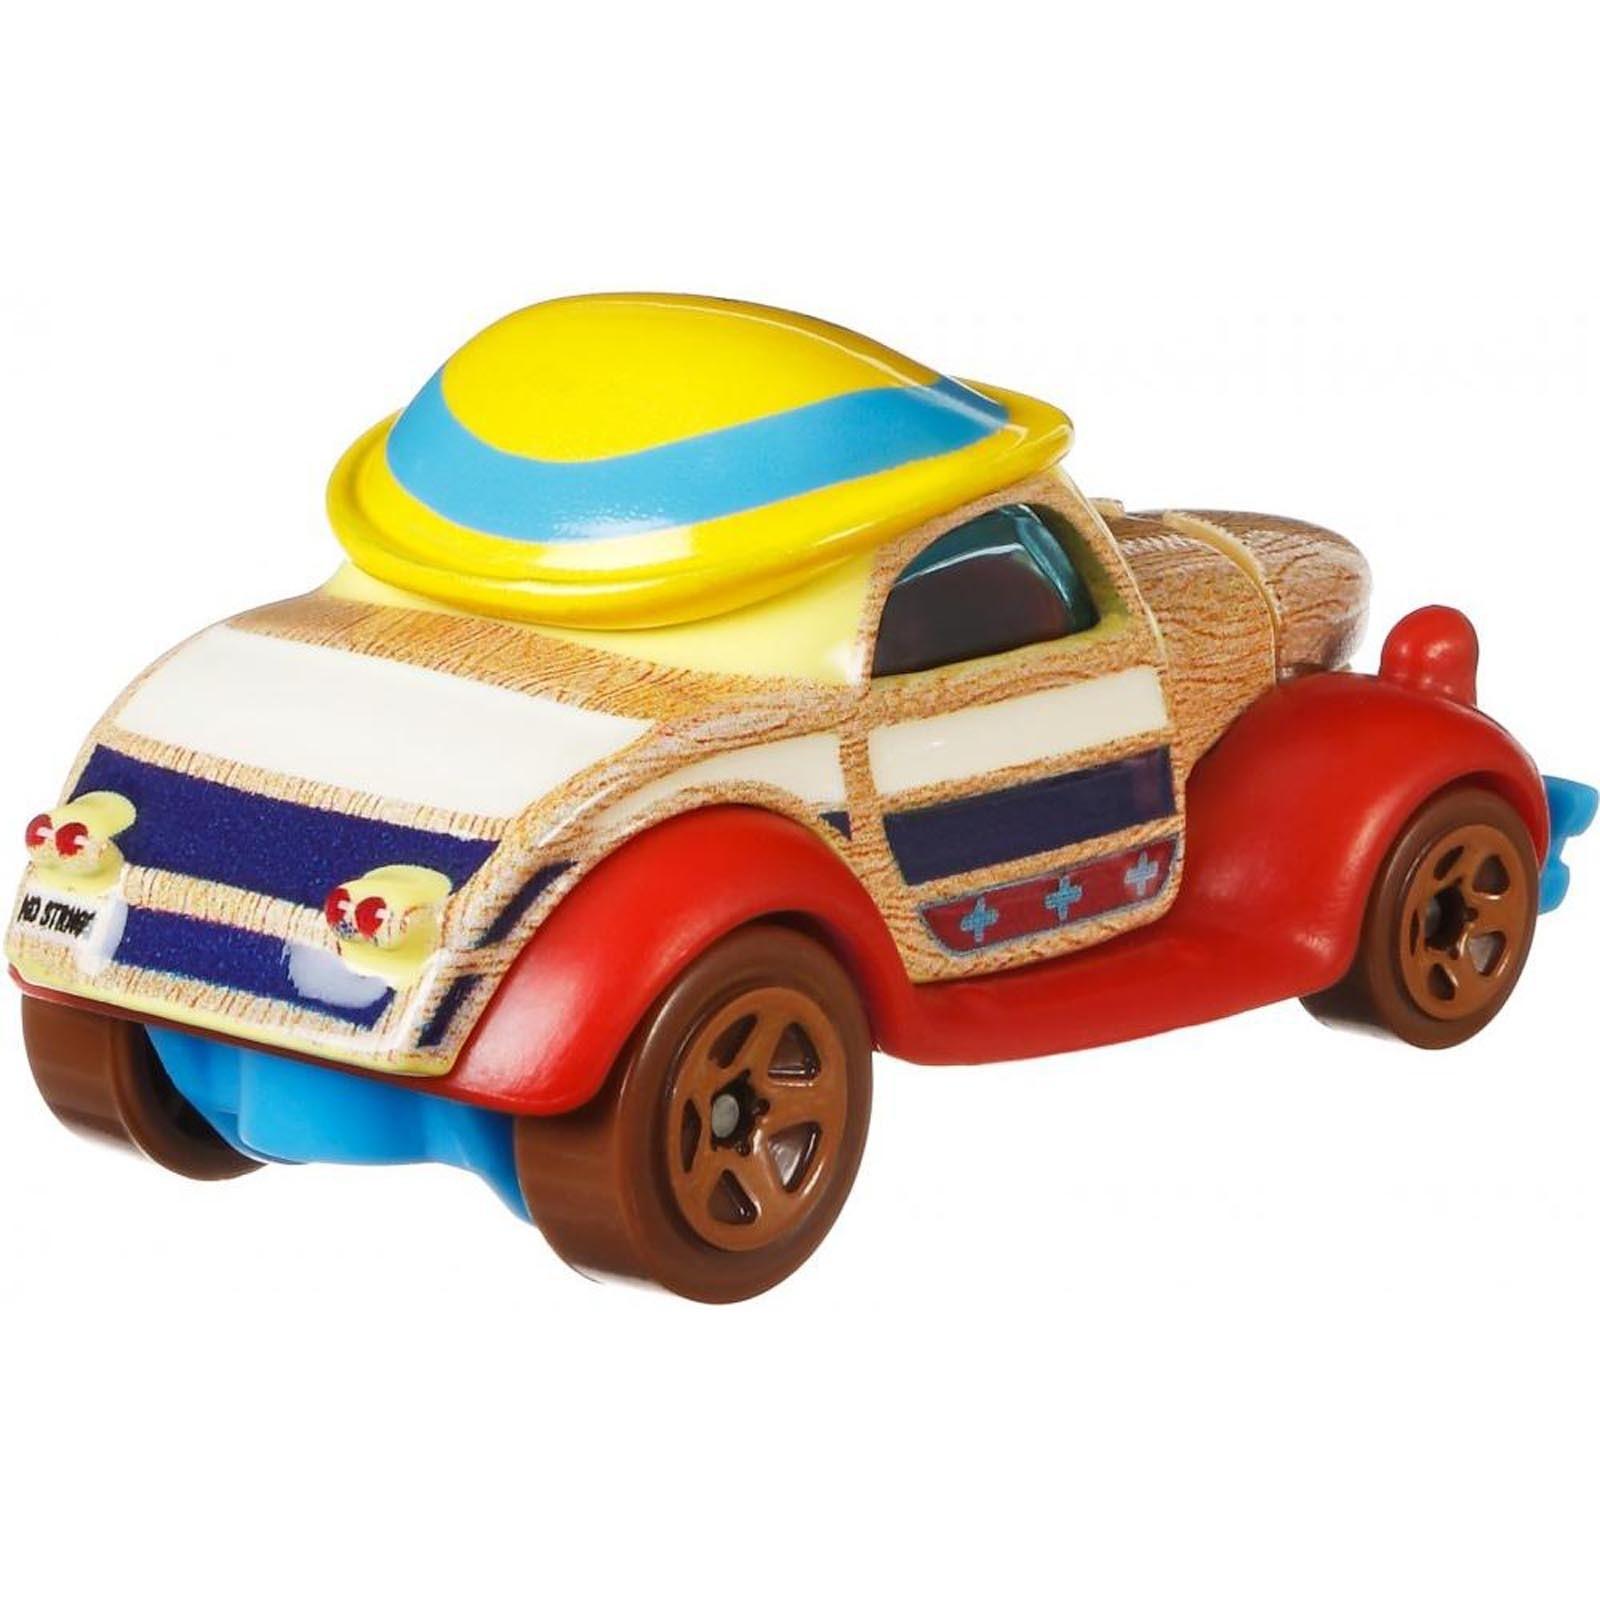 Hot Wheels - Pinóquio - Disney - Character Cars - FYV85